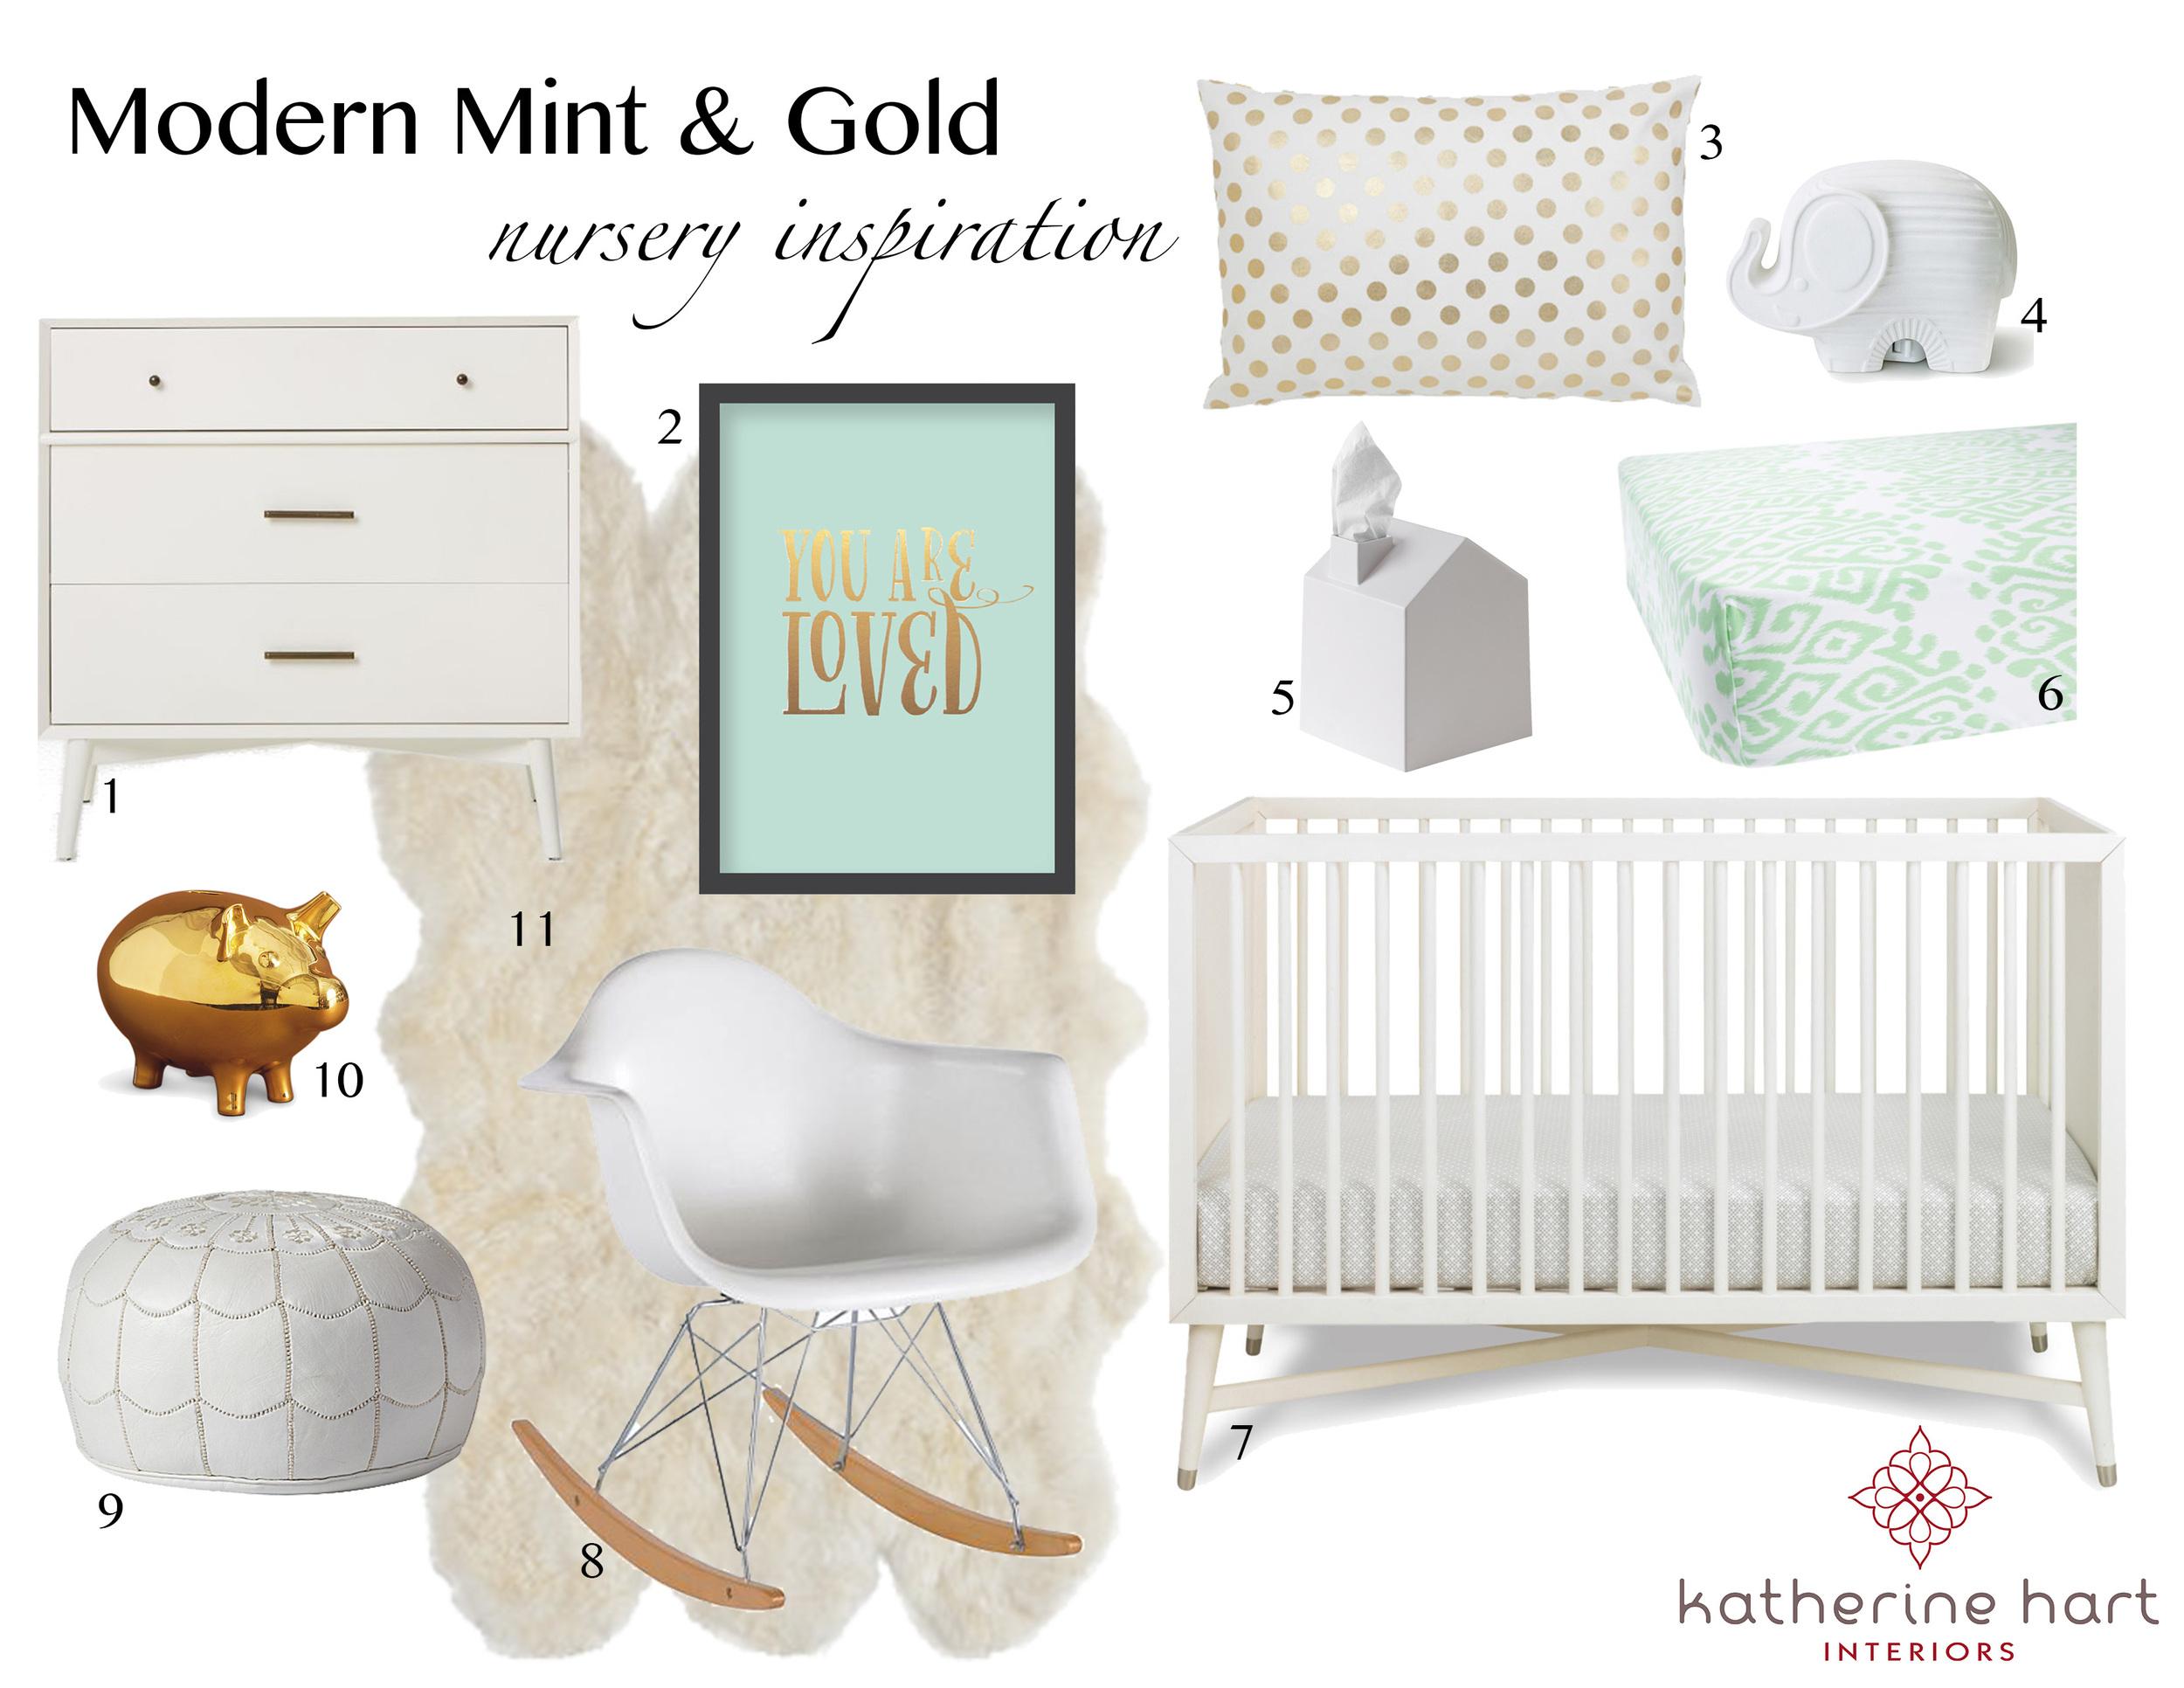 1. Mid-Century  Dresser  | 2. You Are Loved  Print | 3. Polka Dot  Pillow   4. Elephant  Nightlight | 5. Maison  Tissue Box |6. Mint  Crib Sheet   7. Mid-Century  Crib | 8. Retro  Rocker | 9. Moroccan Leather  Pouf | 10.  Piggy Bank | 11. Sheepskin  Rug